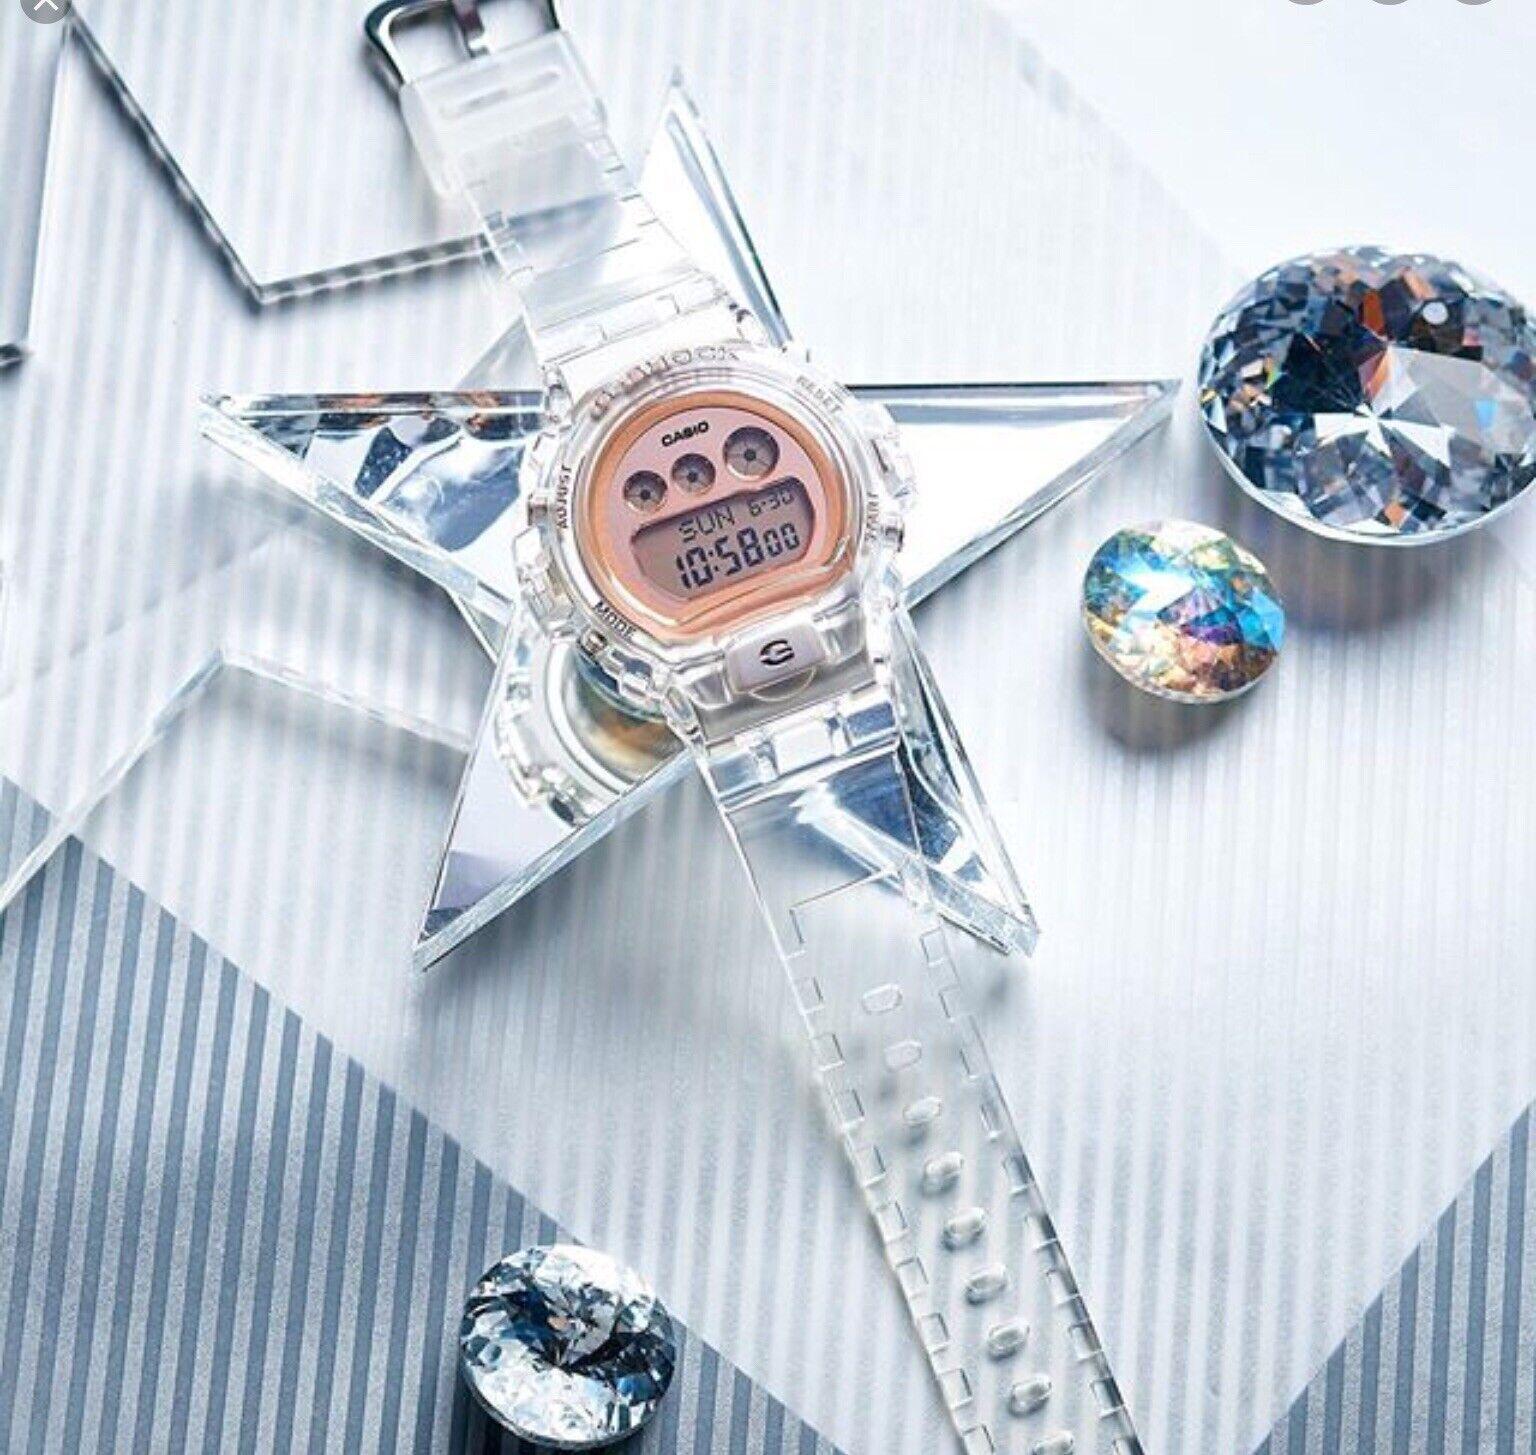 Casio G-Shock S-Series Watch GMD-S6900SR-7ER LATEST RELEASE+2 YEARS WARRANTY@BOX